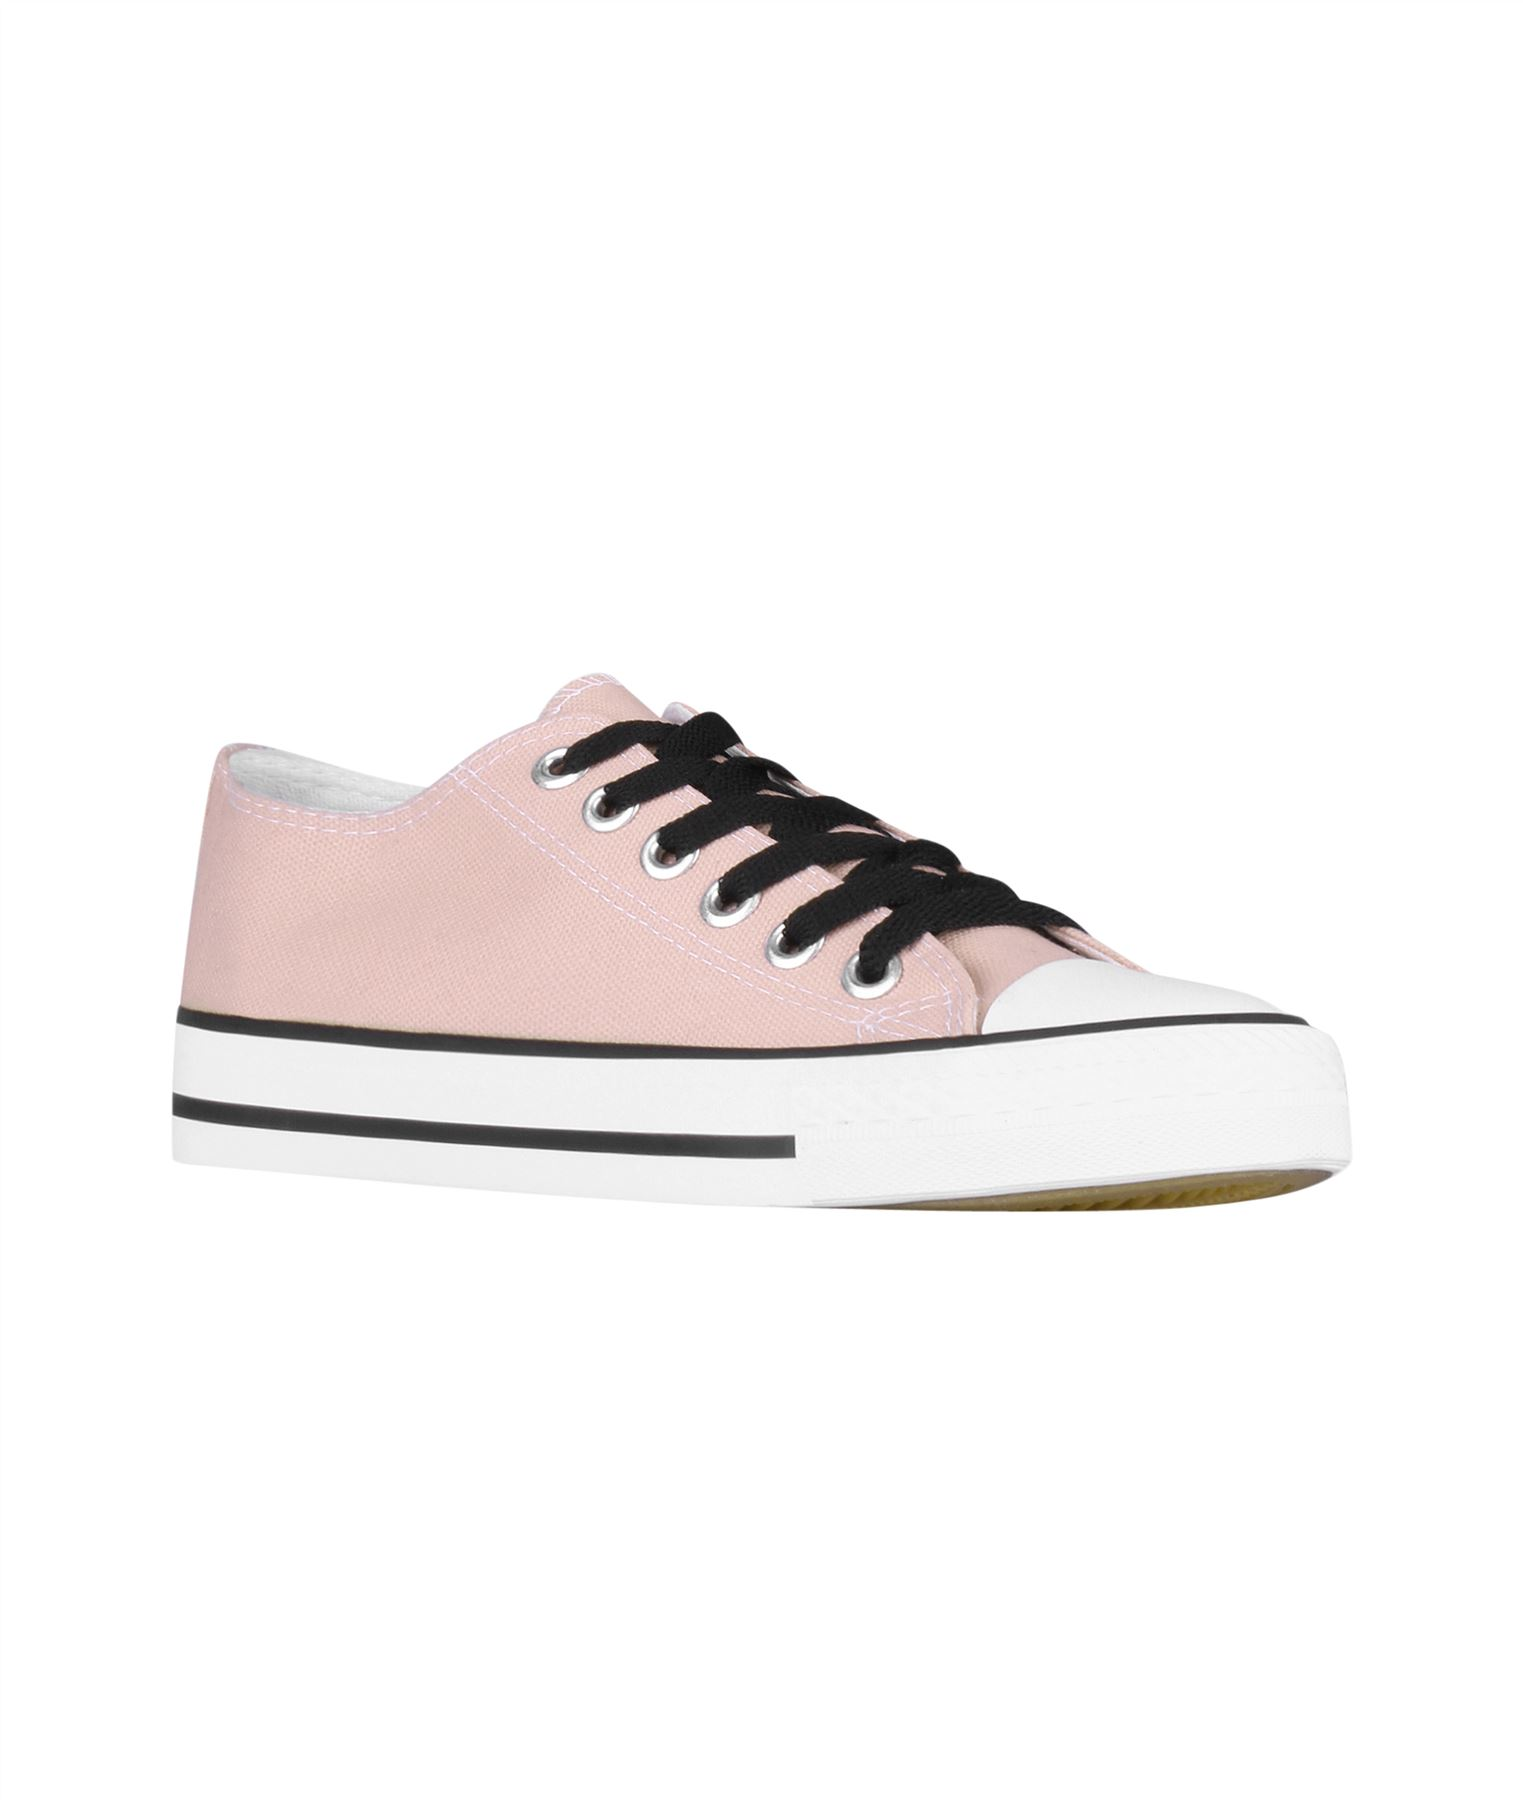 Zapatillas-Mujer-Casuales-Deportiva-Barata-Lona-Moda-Originales-Outlet-Tela-Moda miniatura 47